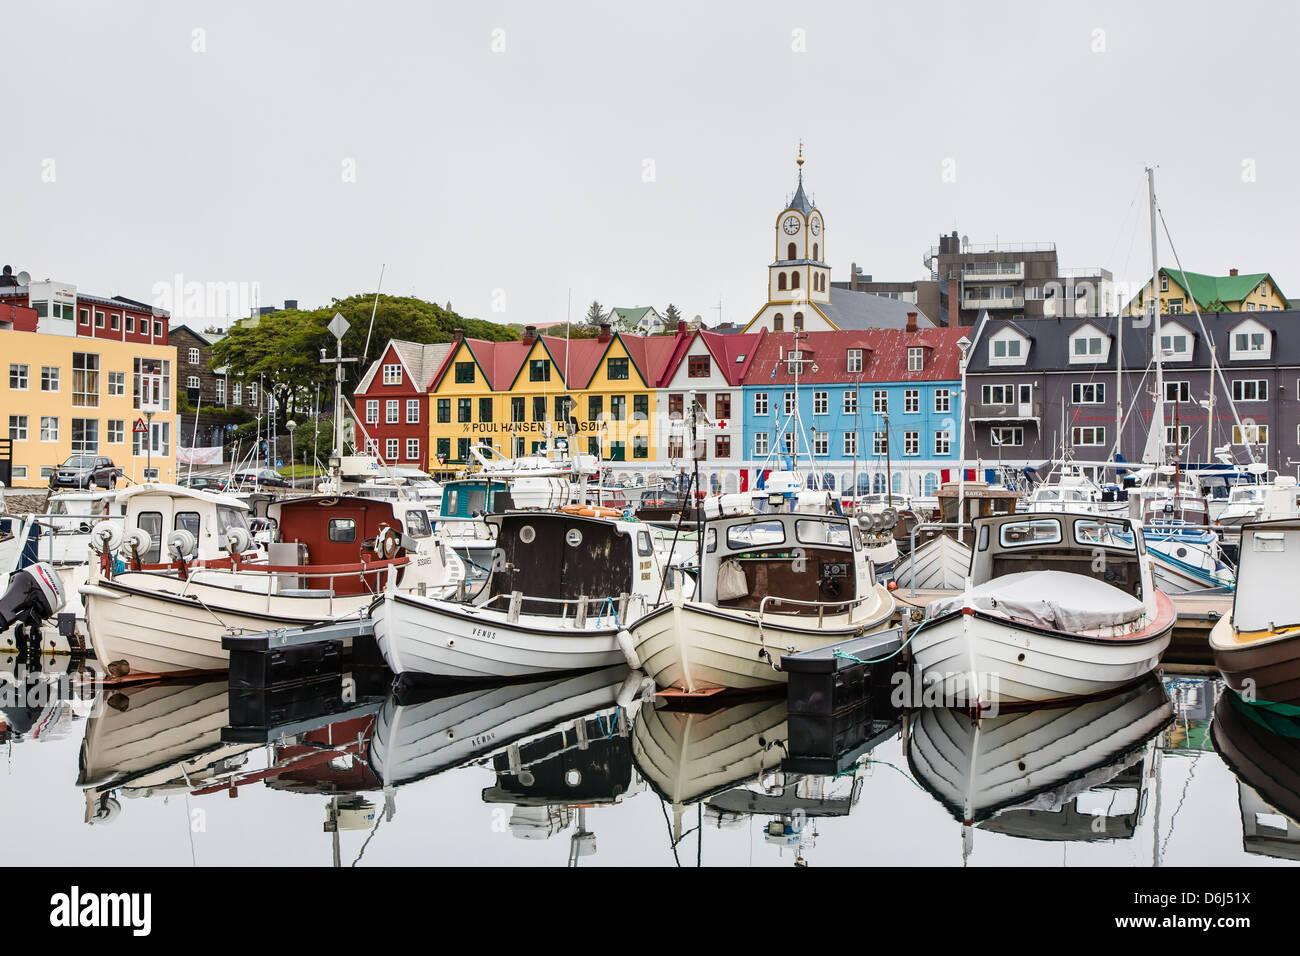 Port de Torshavn, Streymoy, îles Féroé, Danemark, Europe Photo Stock